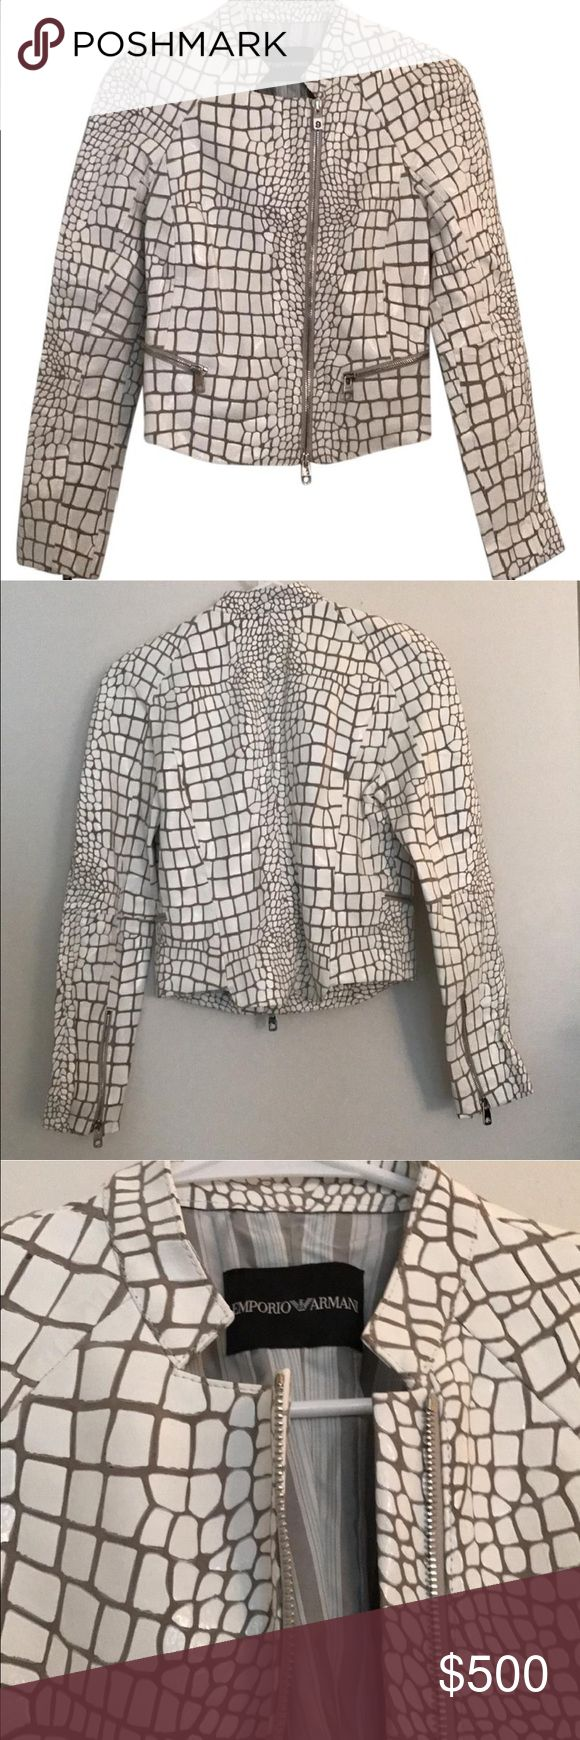 Emporio Armani Leather Jacket Beautiful snakeskin leather biker jacket Emporio Armani Jackets & Coats